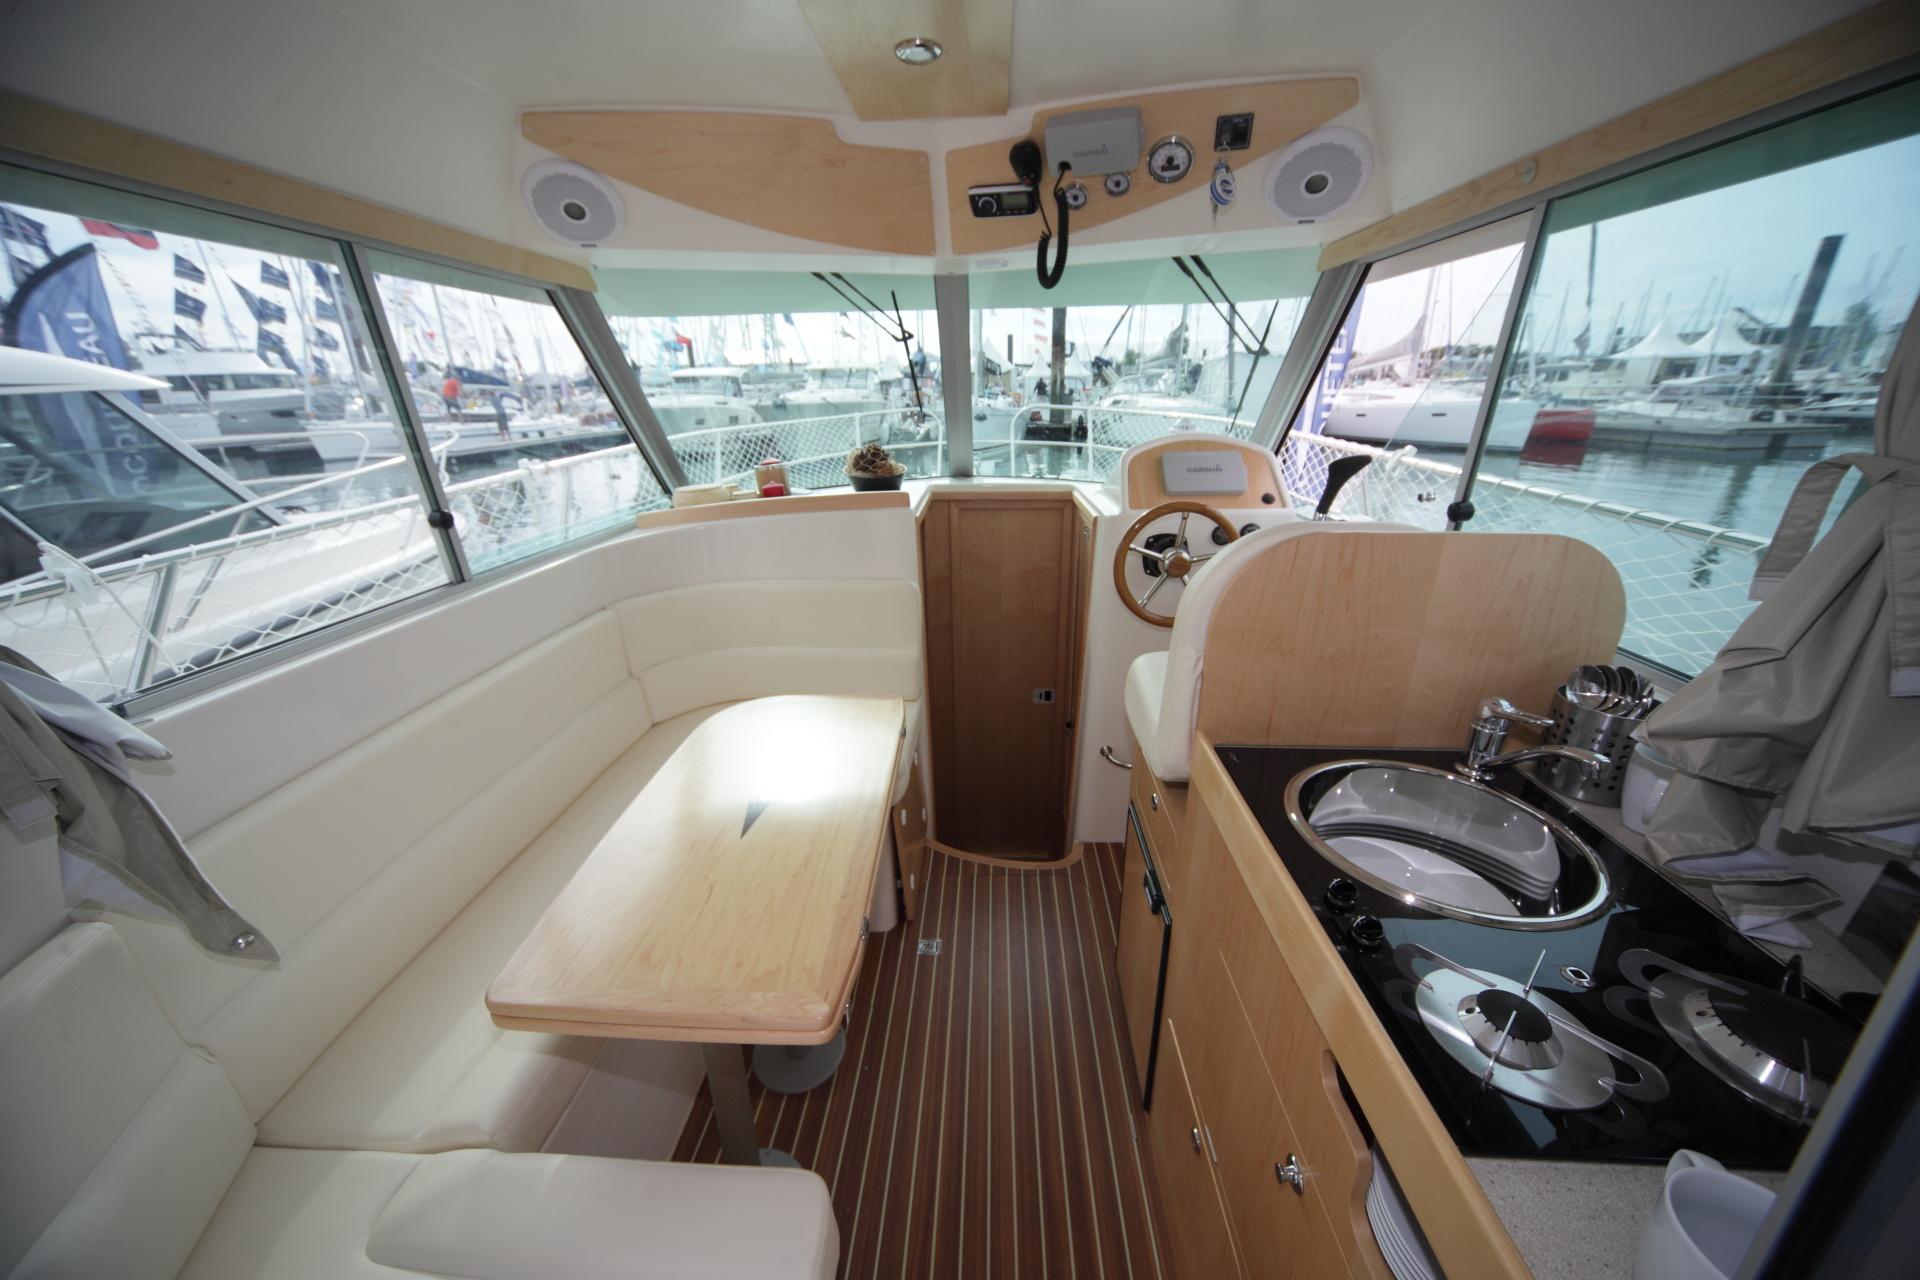 bateau  u00e0 moteur ocqueteau range cruiser 885 inboard